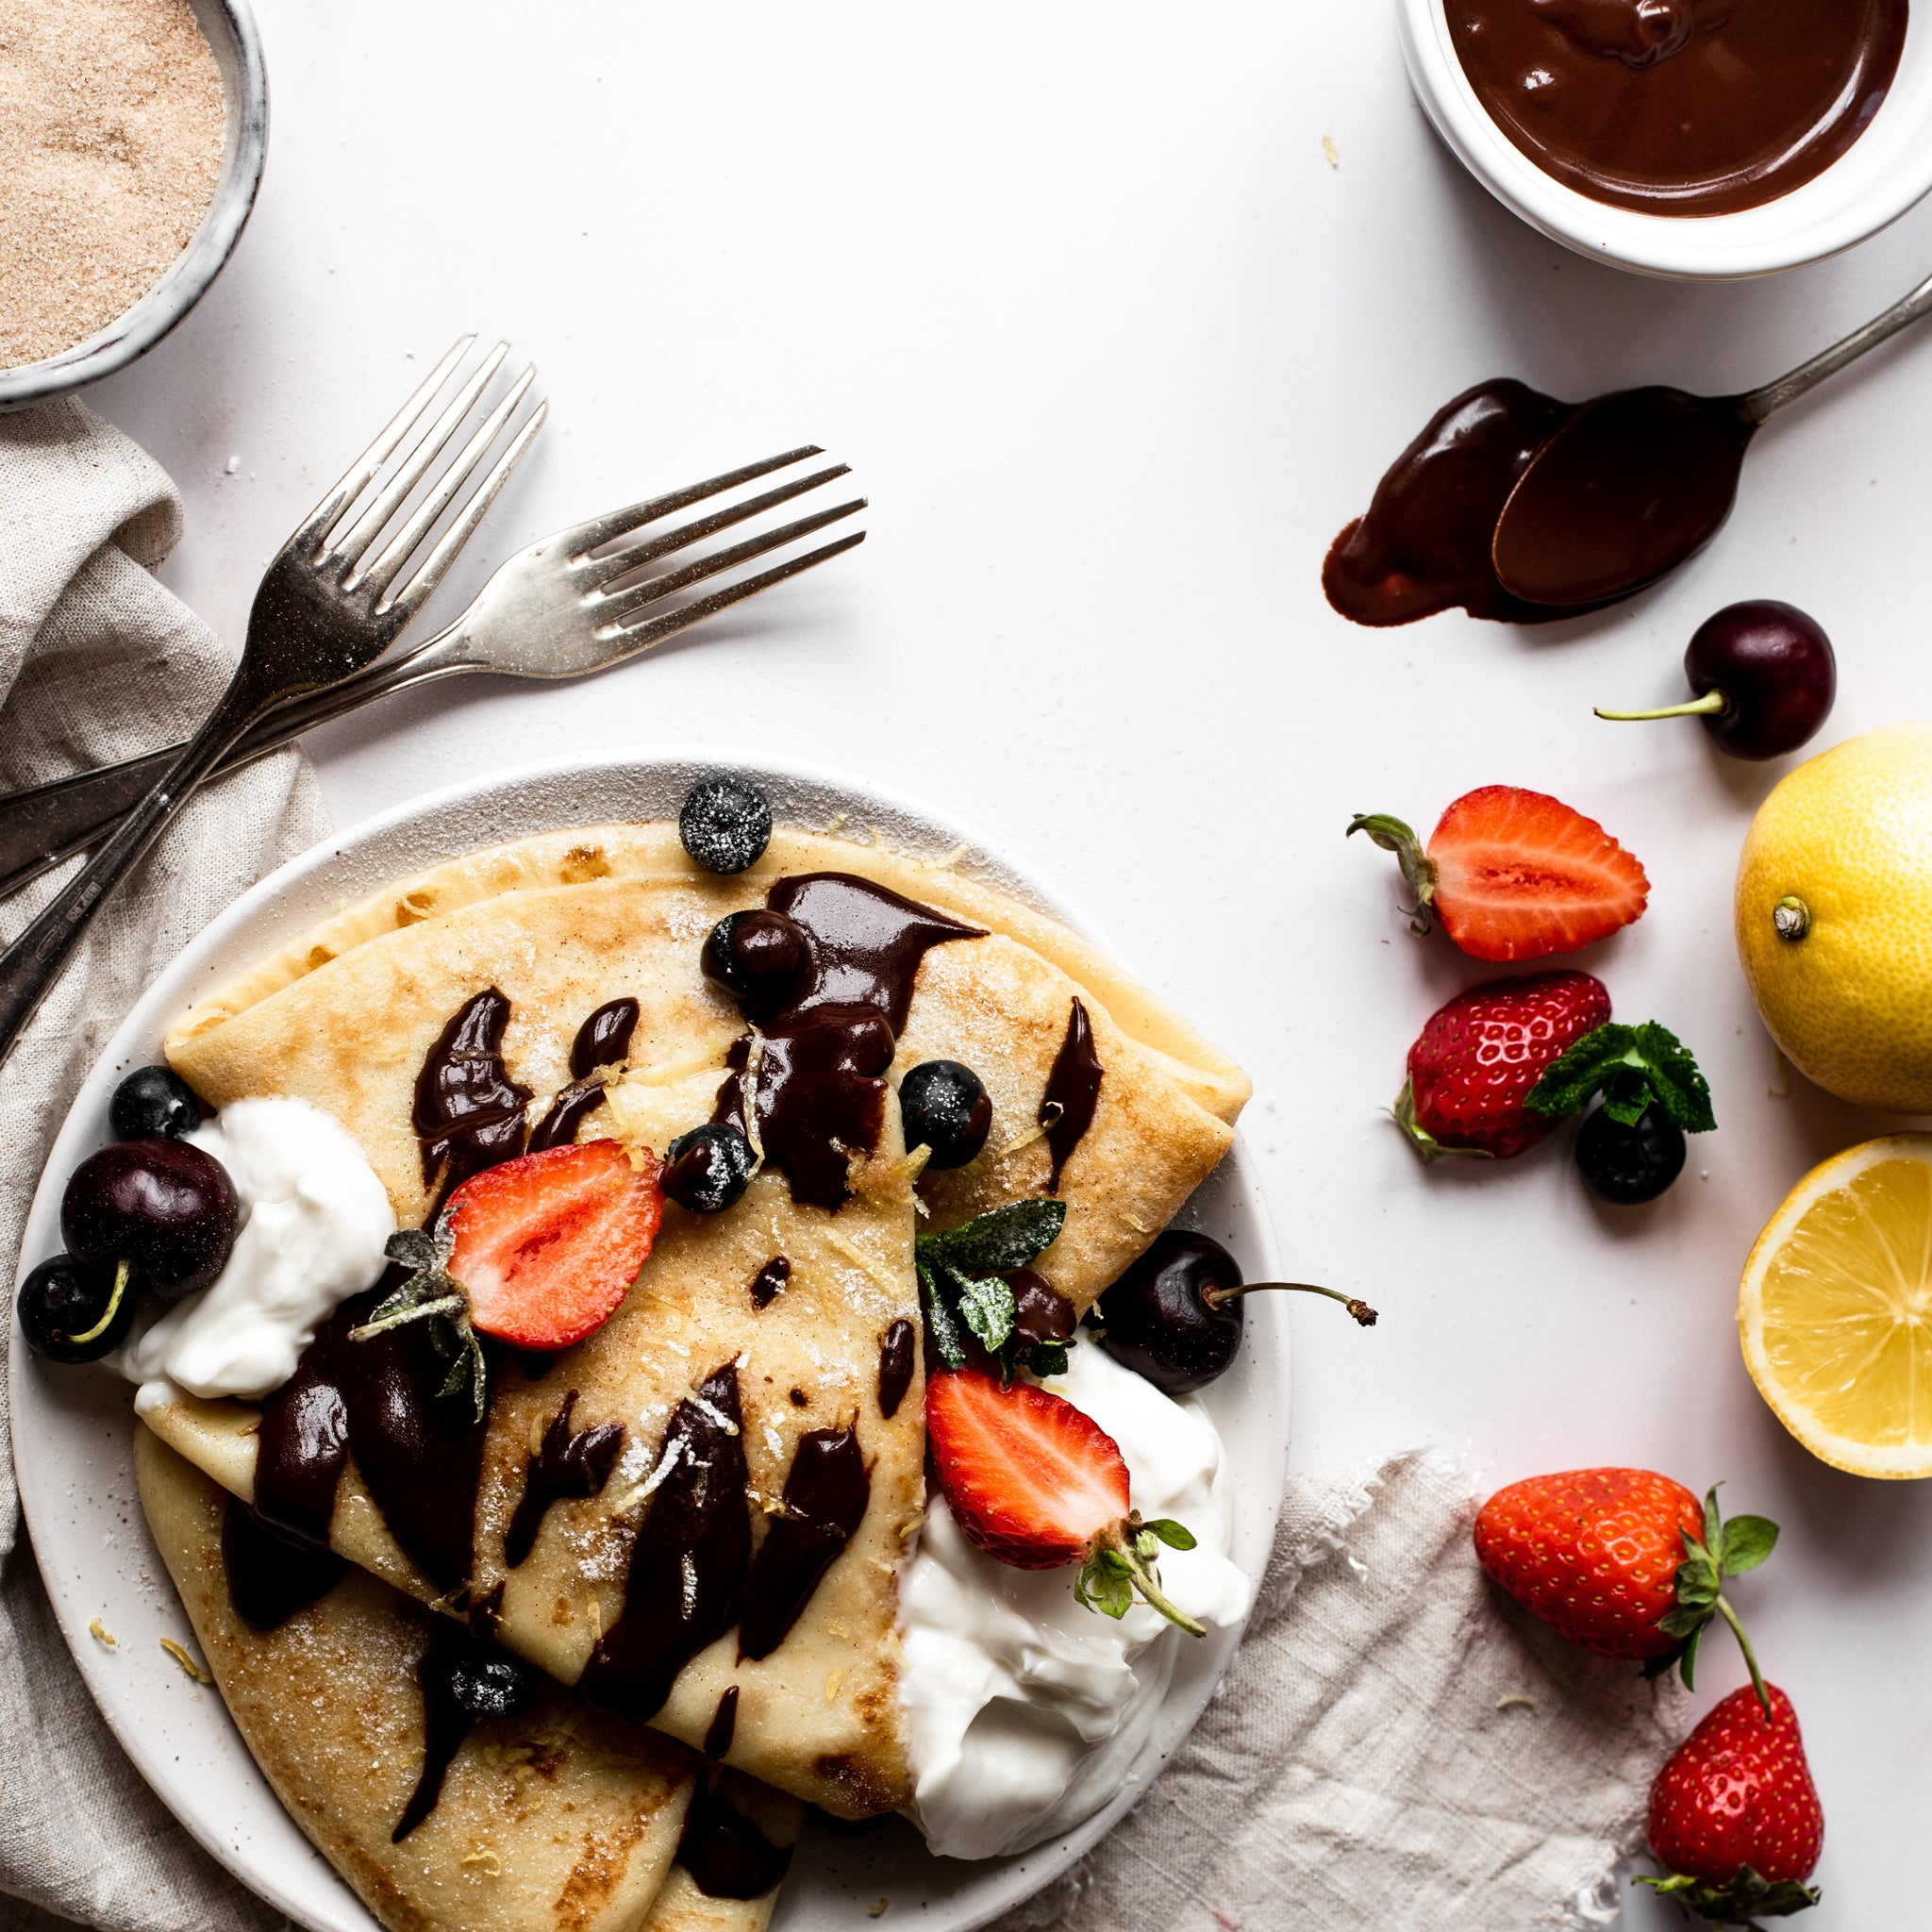 Basic-Pancakes-SQUARE-4.jpg